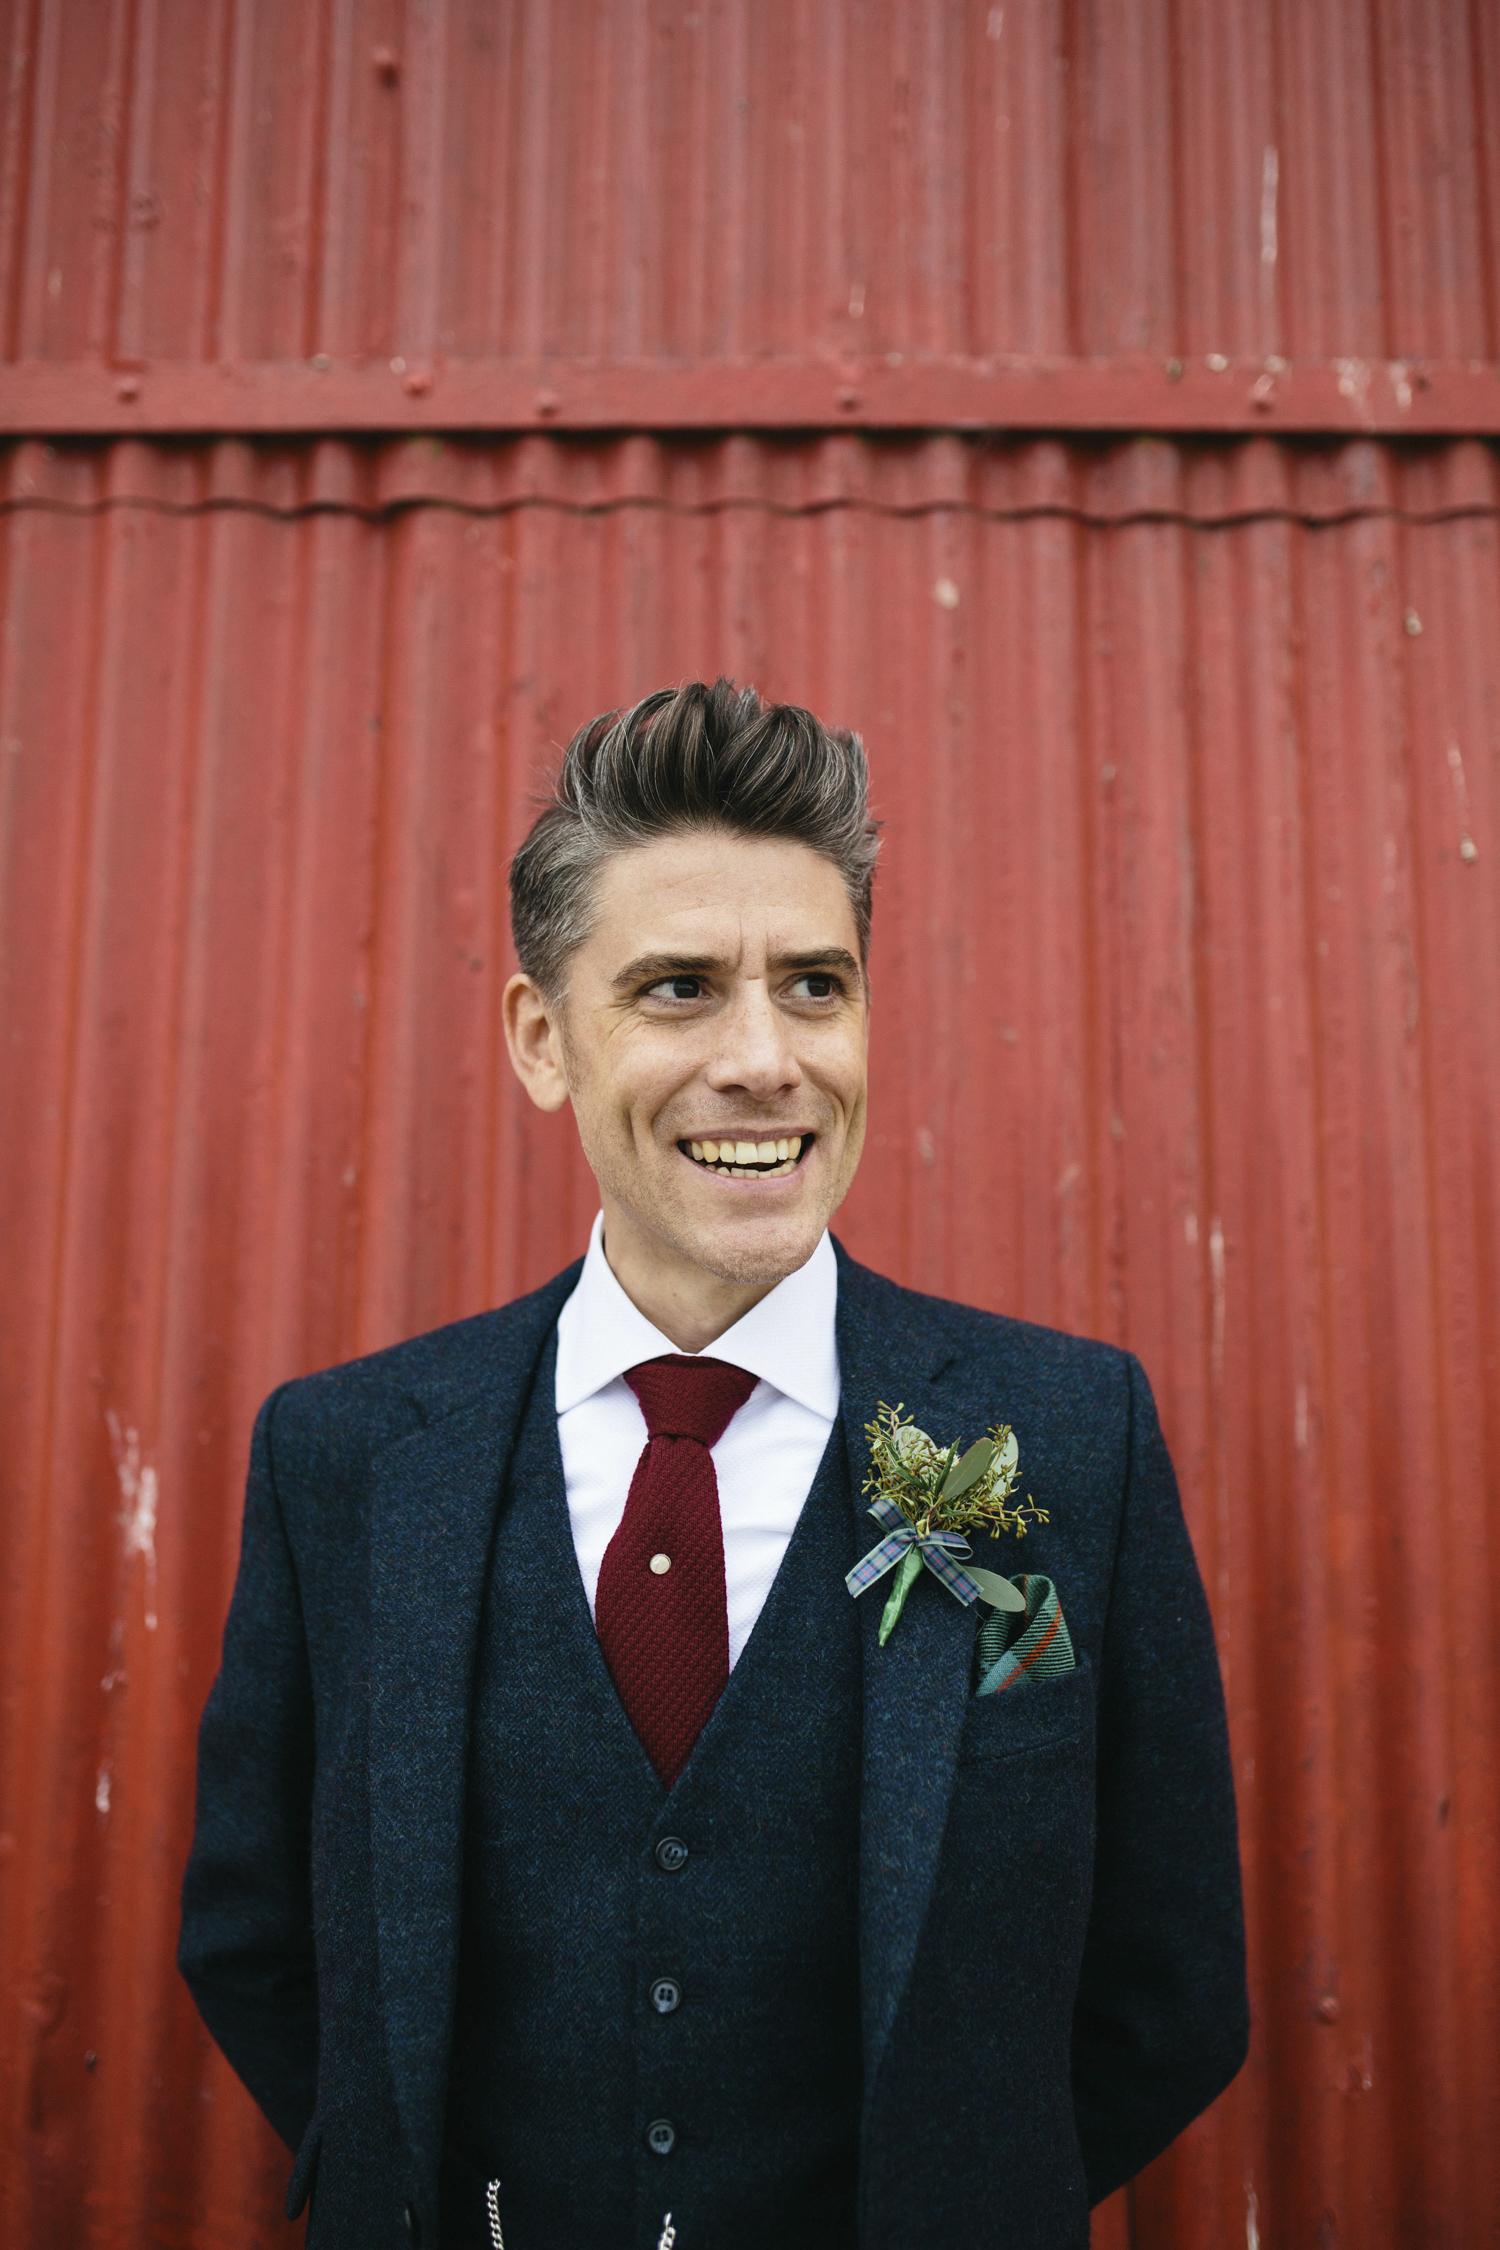 Alternative_wedding_photographer_scotland_fife_standrews_kinkell-26.jpg